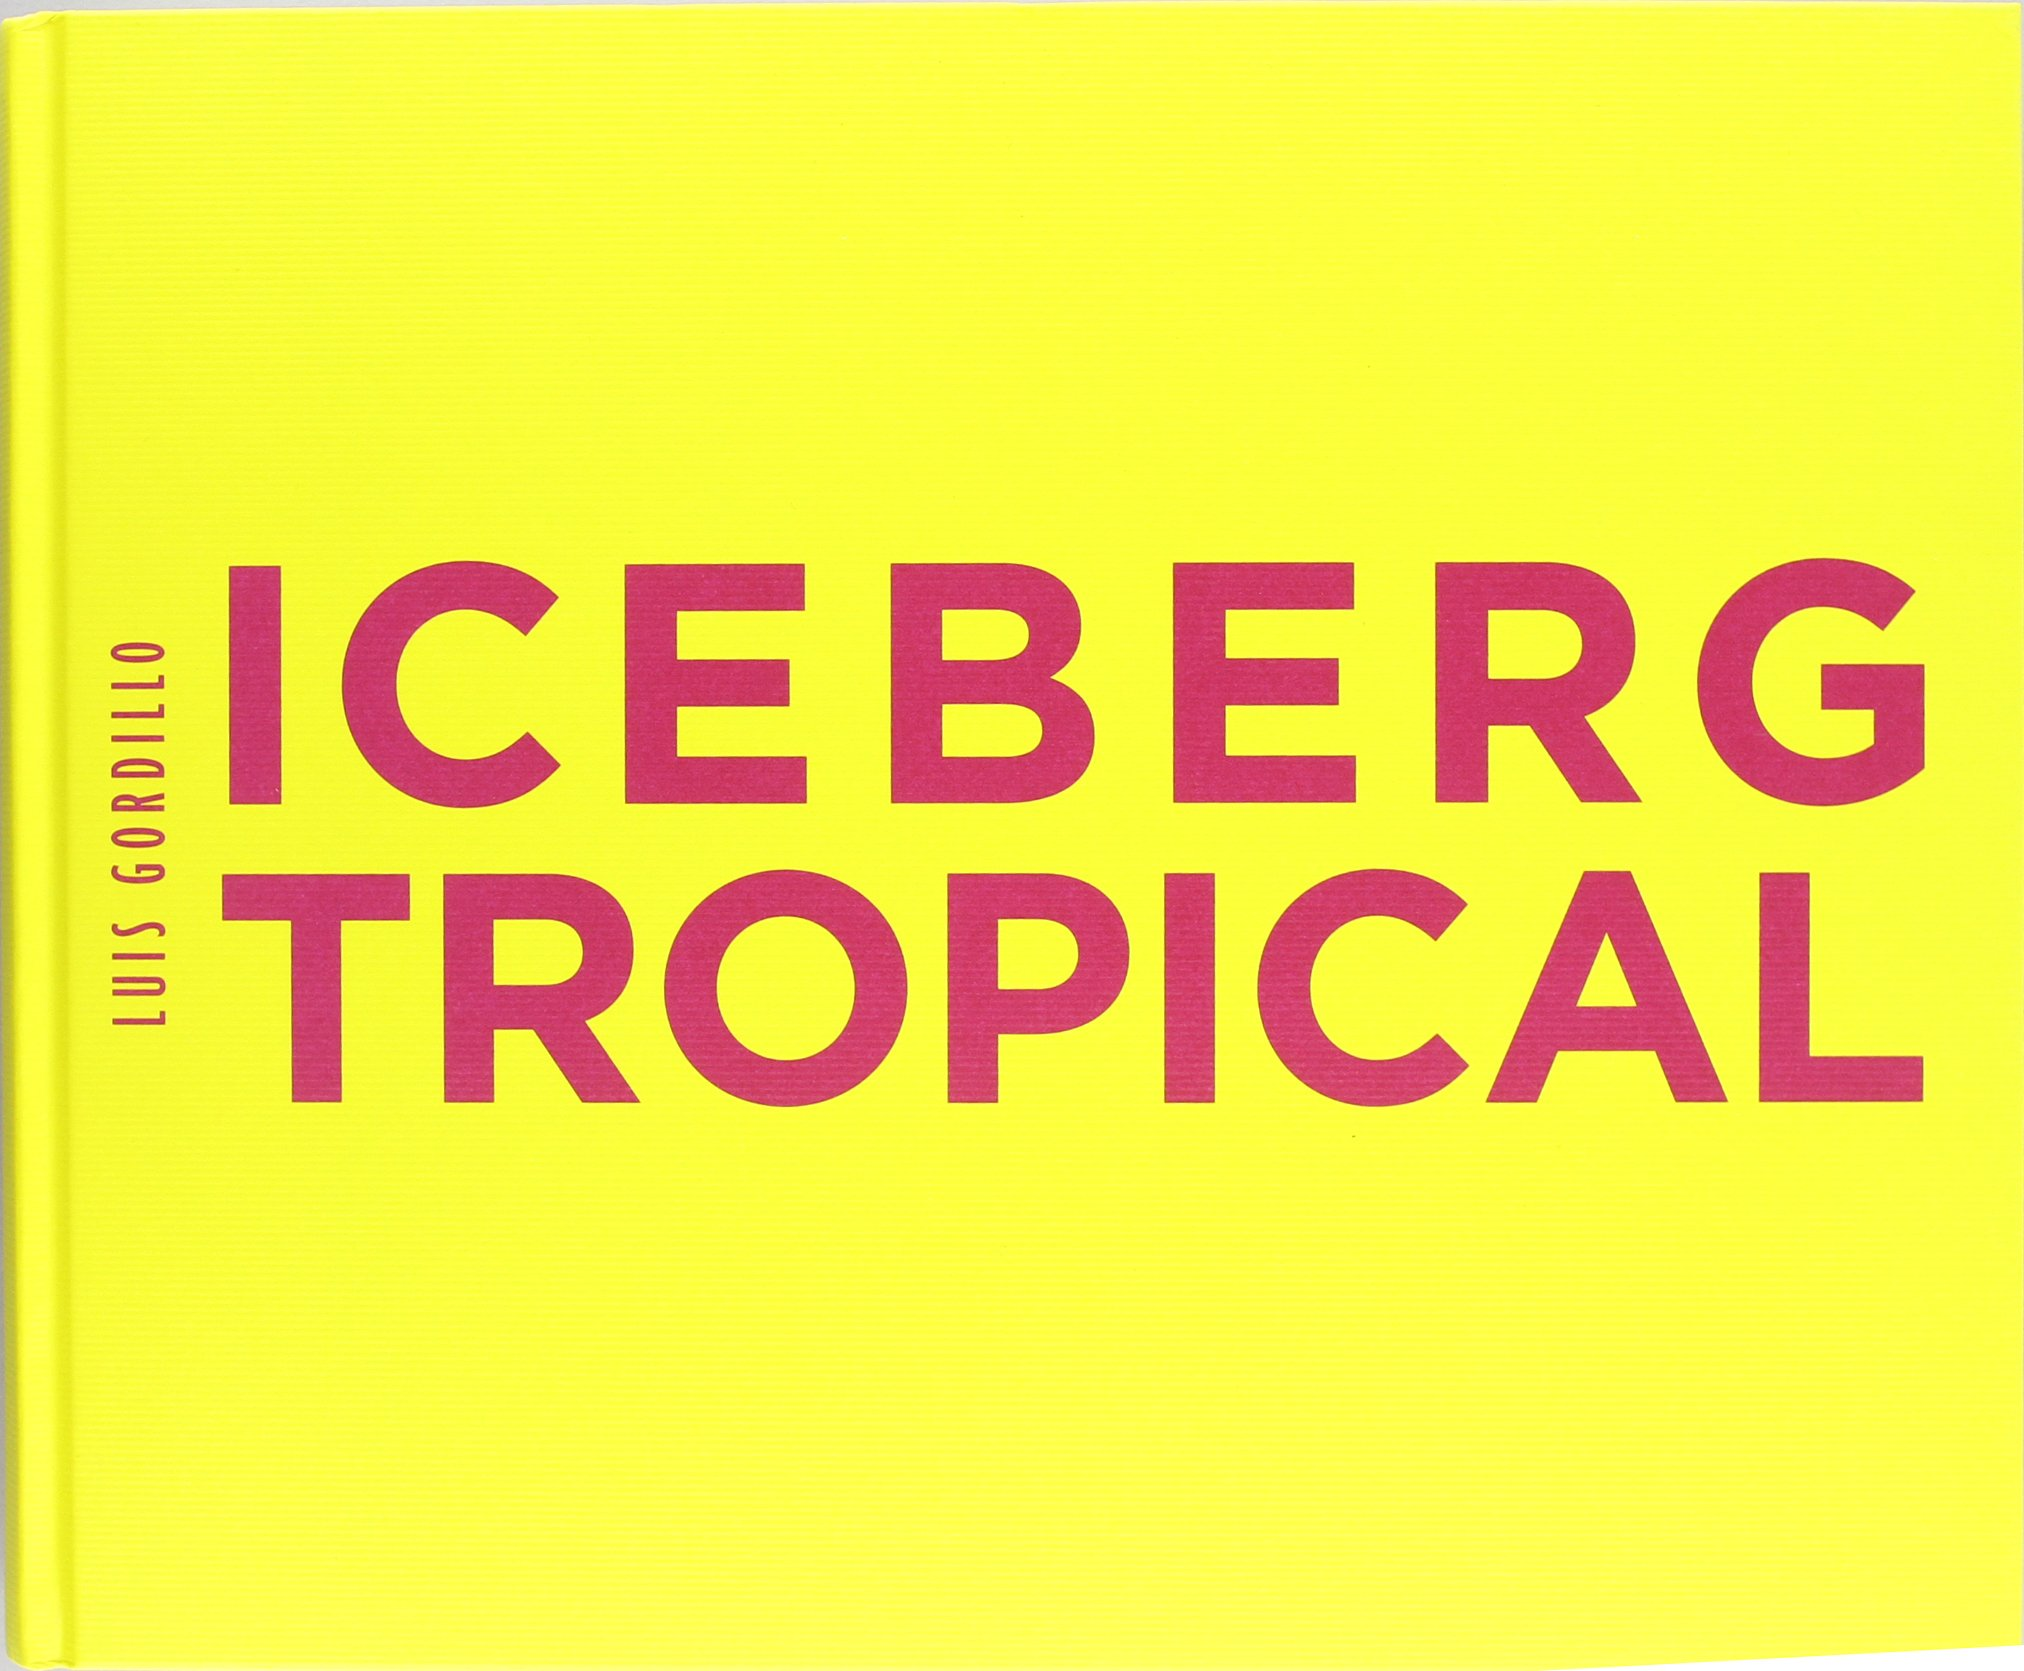 Download Iceberg Tropical/ Tropical Iceberg: Antologica 1959-2007, Museo Nacional Centro de Arte Reina Sofia, Madrid, 19 de junio - 15 de Octubre de 2007, ... marzo - 25 der mayo de 2008 (Spanish Edition) PDF